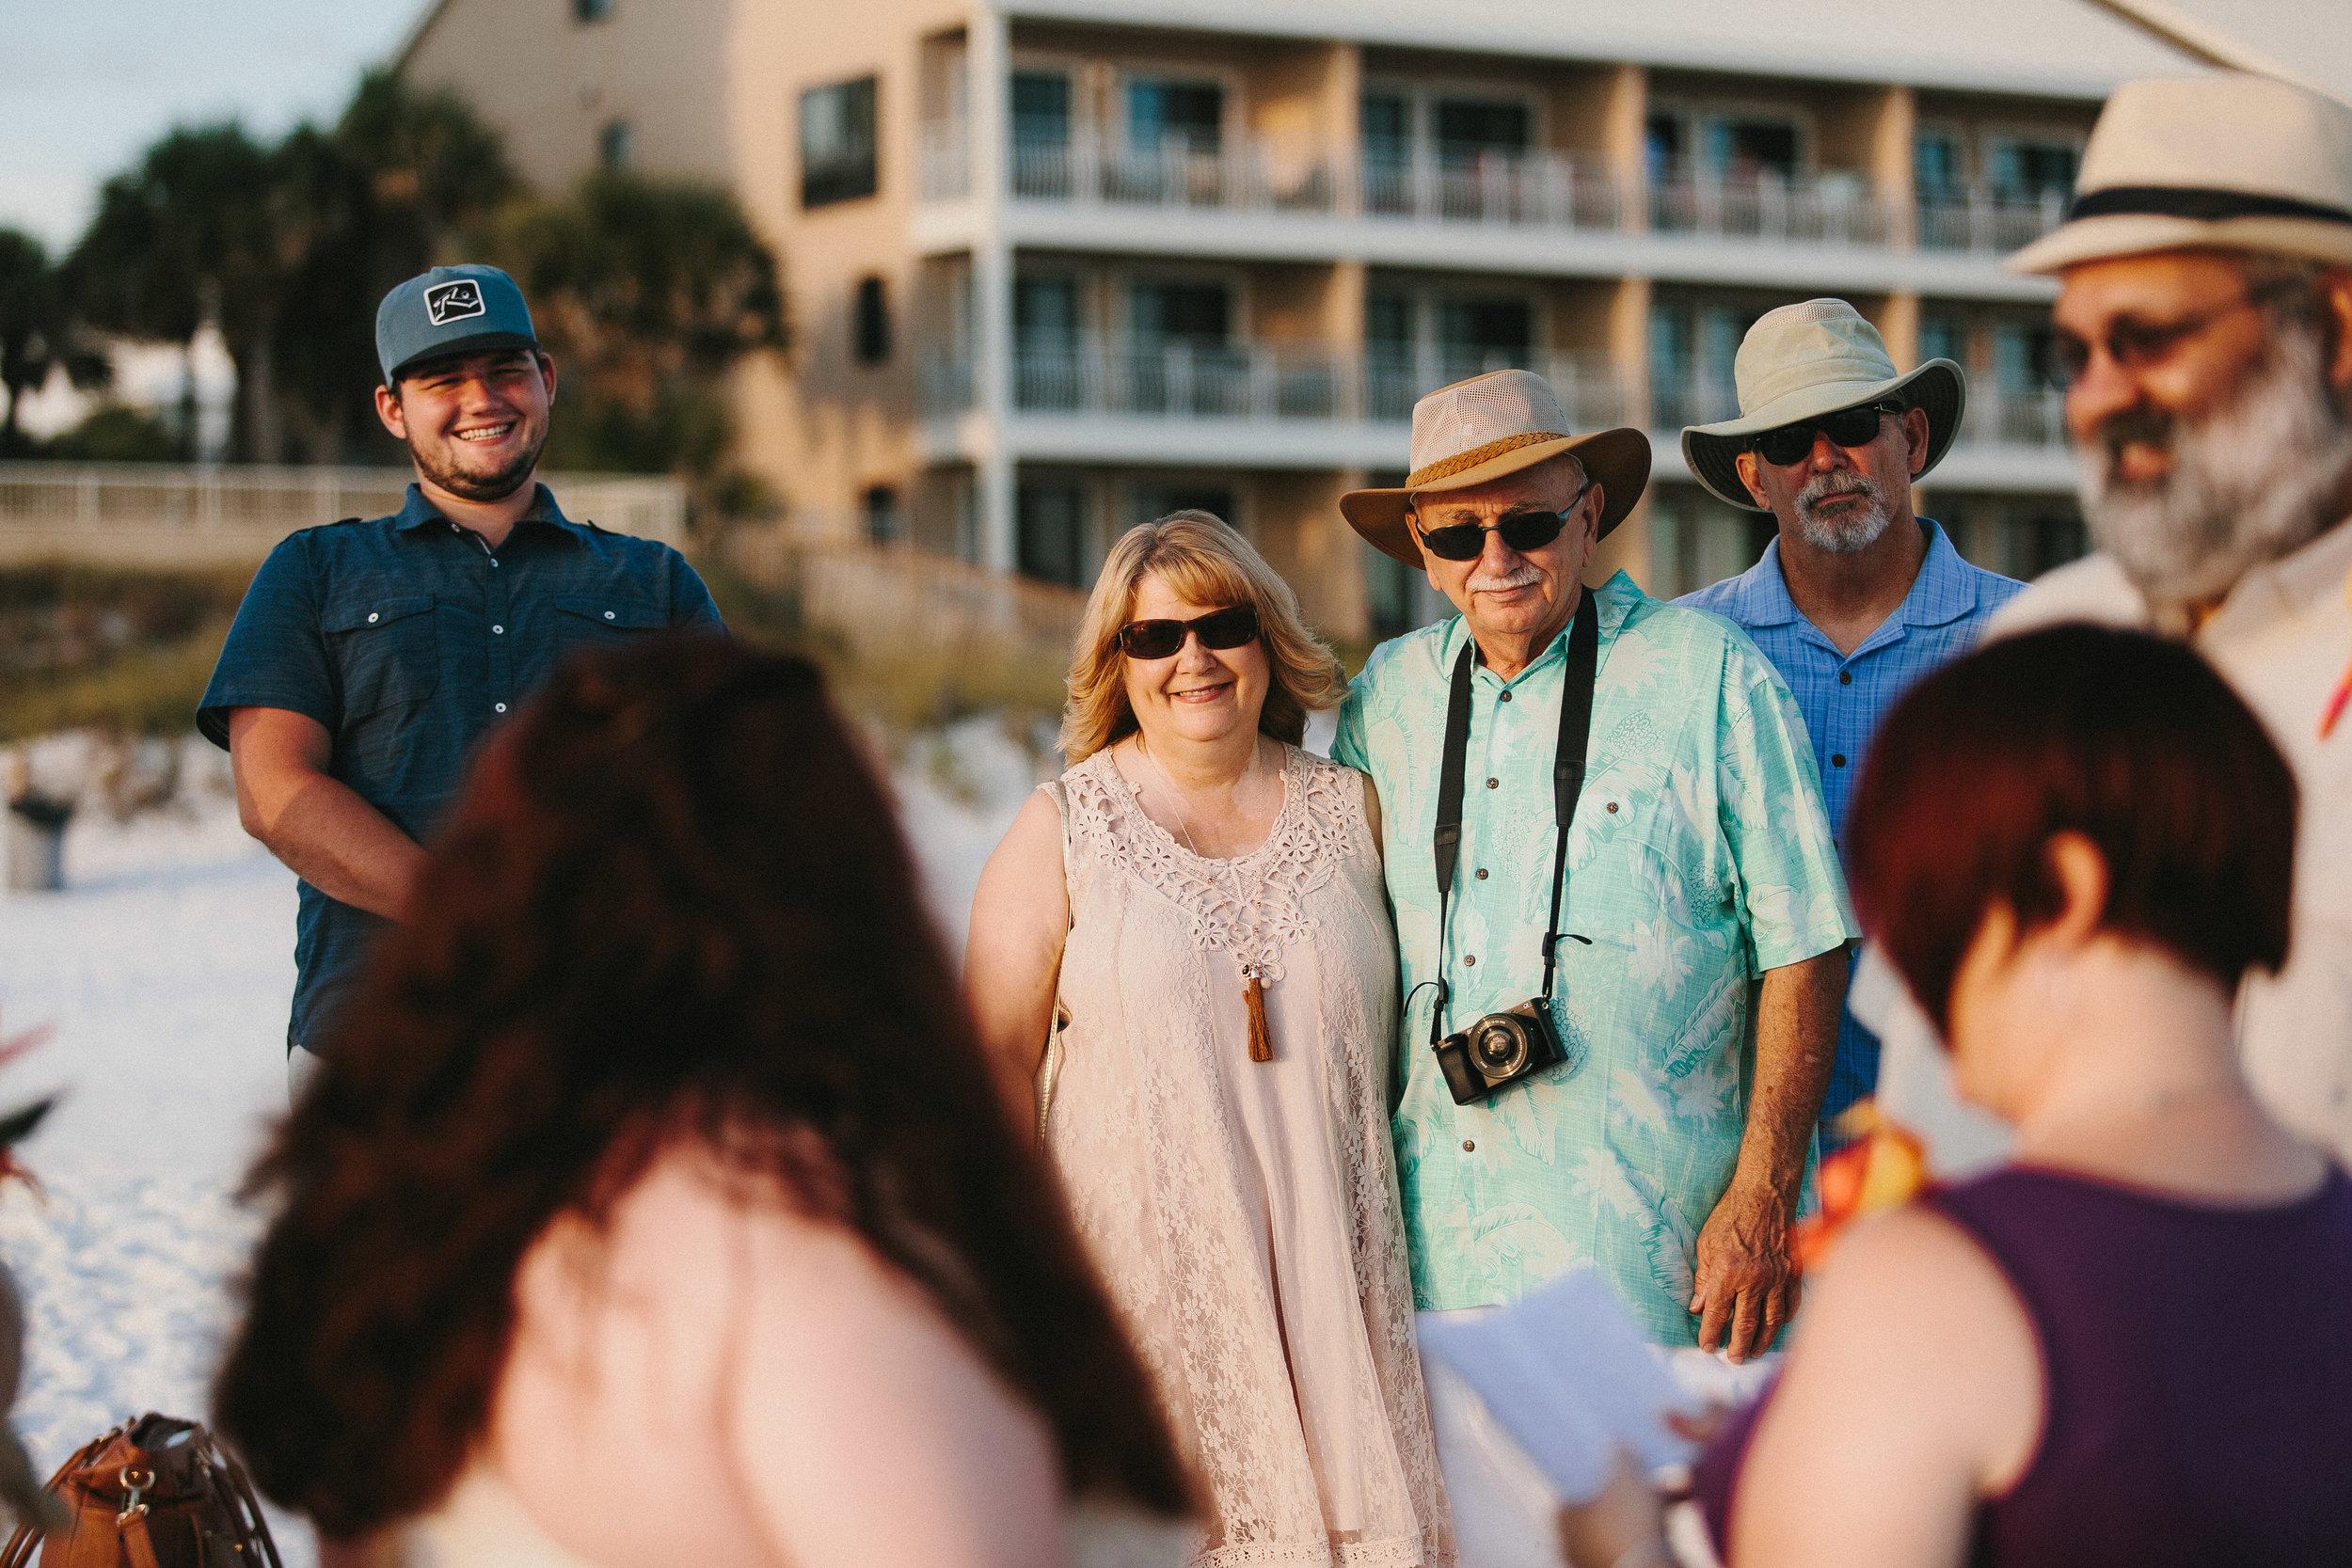 destin_sunset_beach_elopement_intimate_wedding_photographer_florida_documentary_1168.jpg